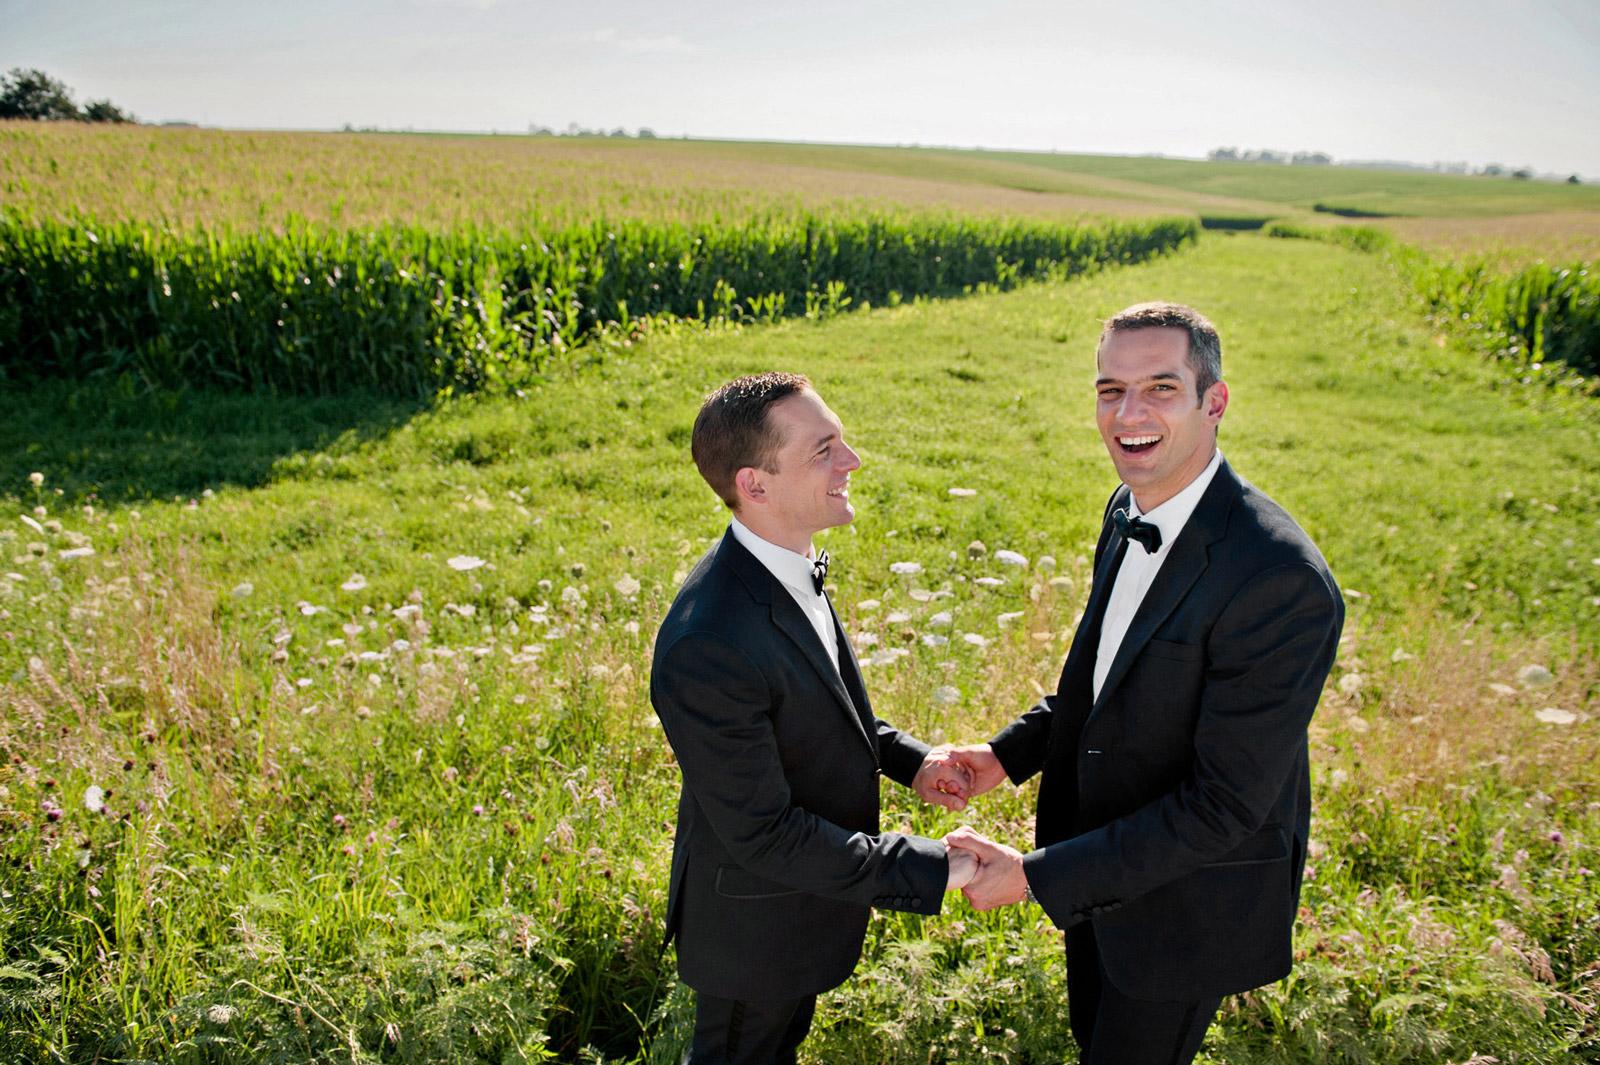 minnesota-wedding-photographers-mark-kegans-904.jpg